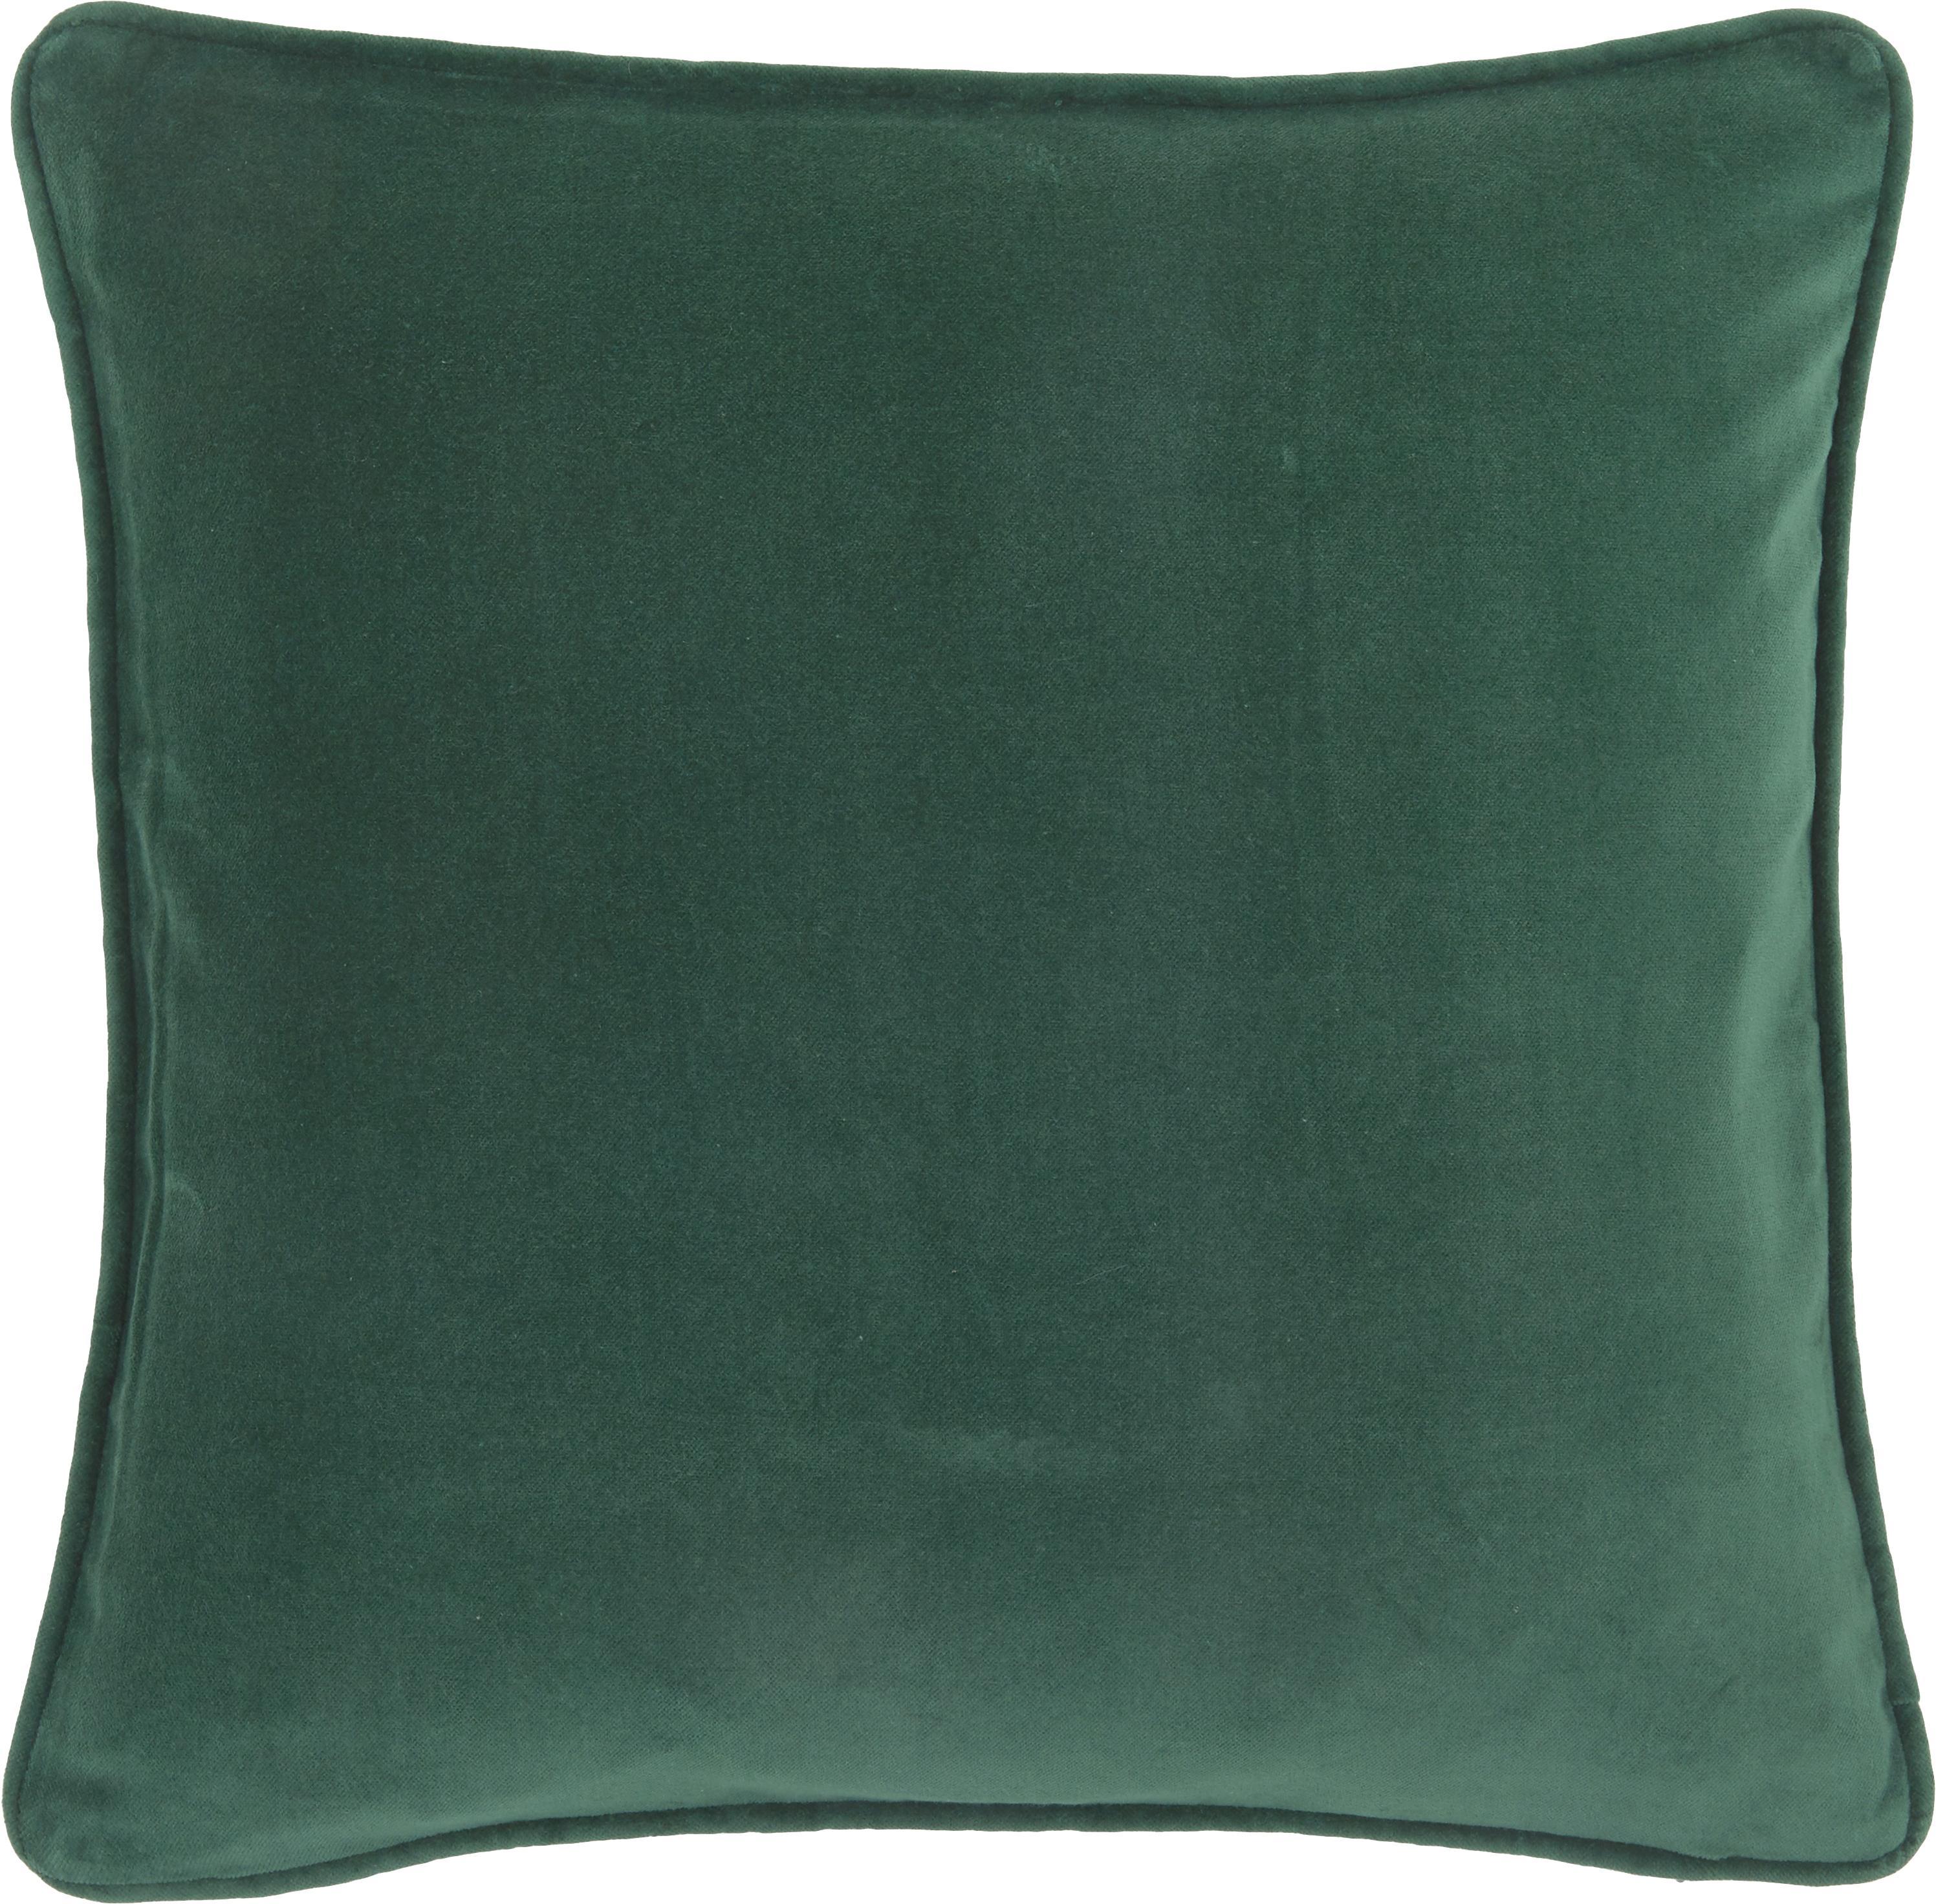 Federa arredo in velluto in verde smeraldo Dana, 100% velluto, Verde smeraldo, Larg. 50 x Lung. 50 cm